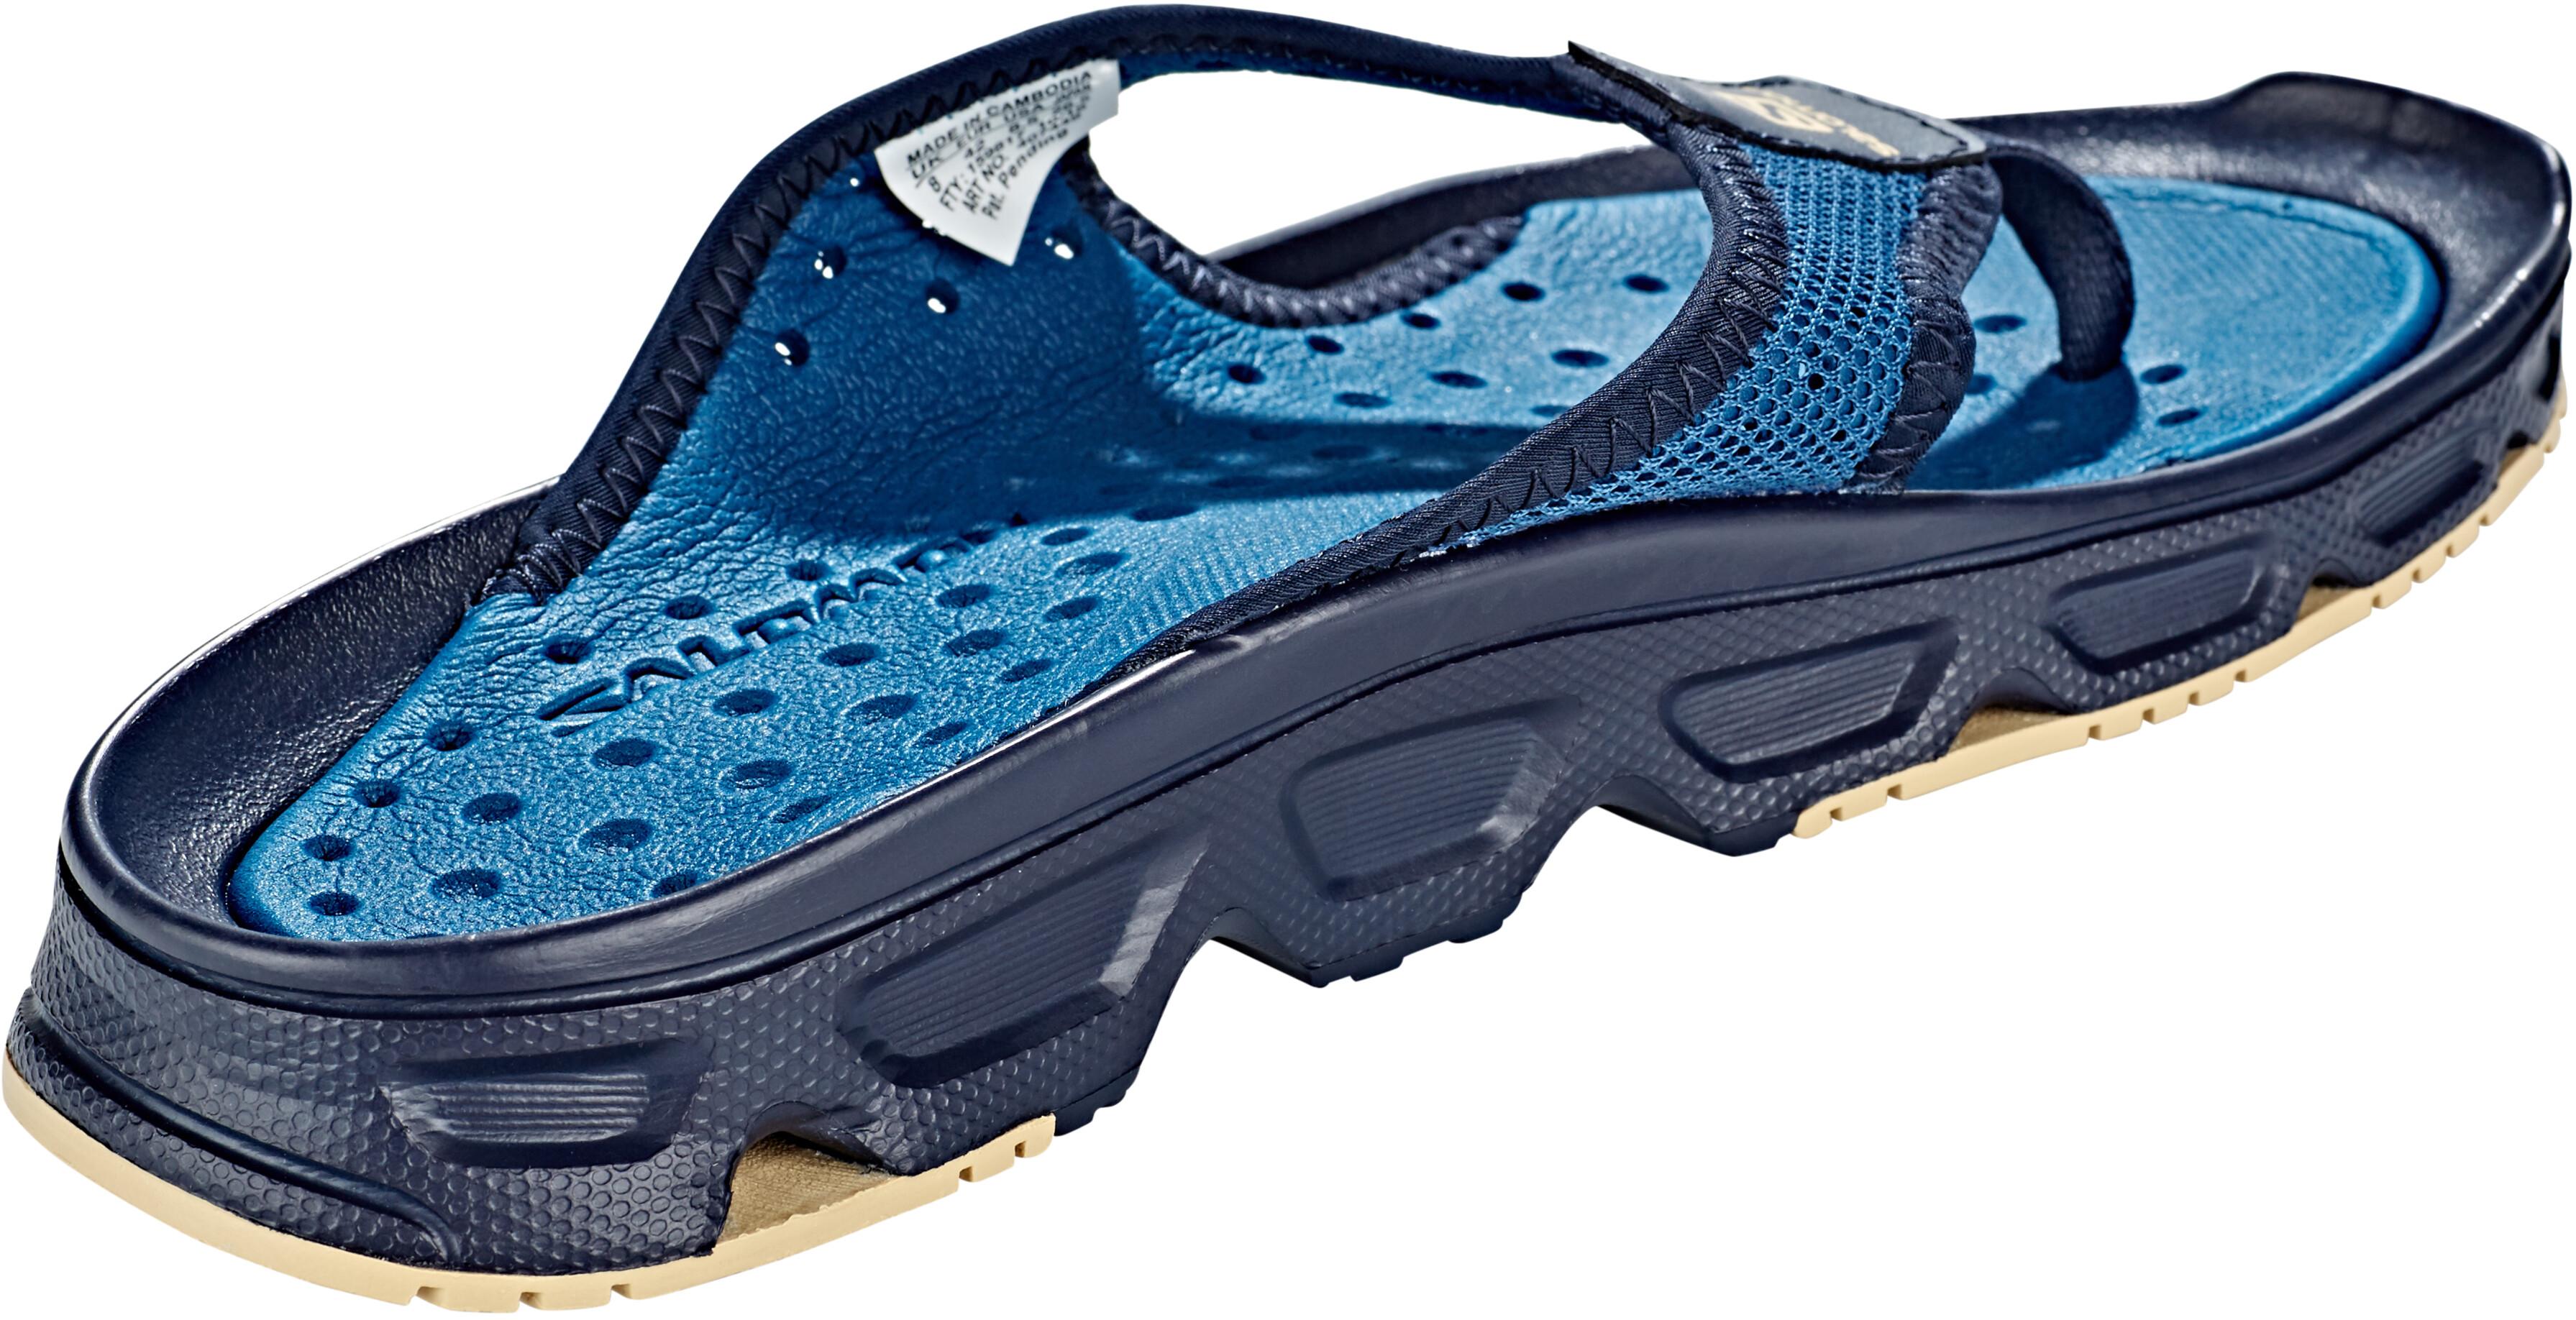 19e53609deb Salomon RX Break 4.0 - Chaussures running Homme - bleu sur CAMPZ !